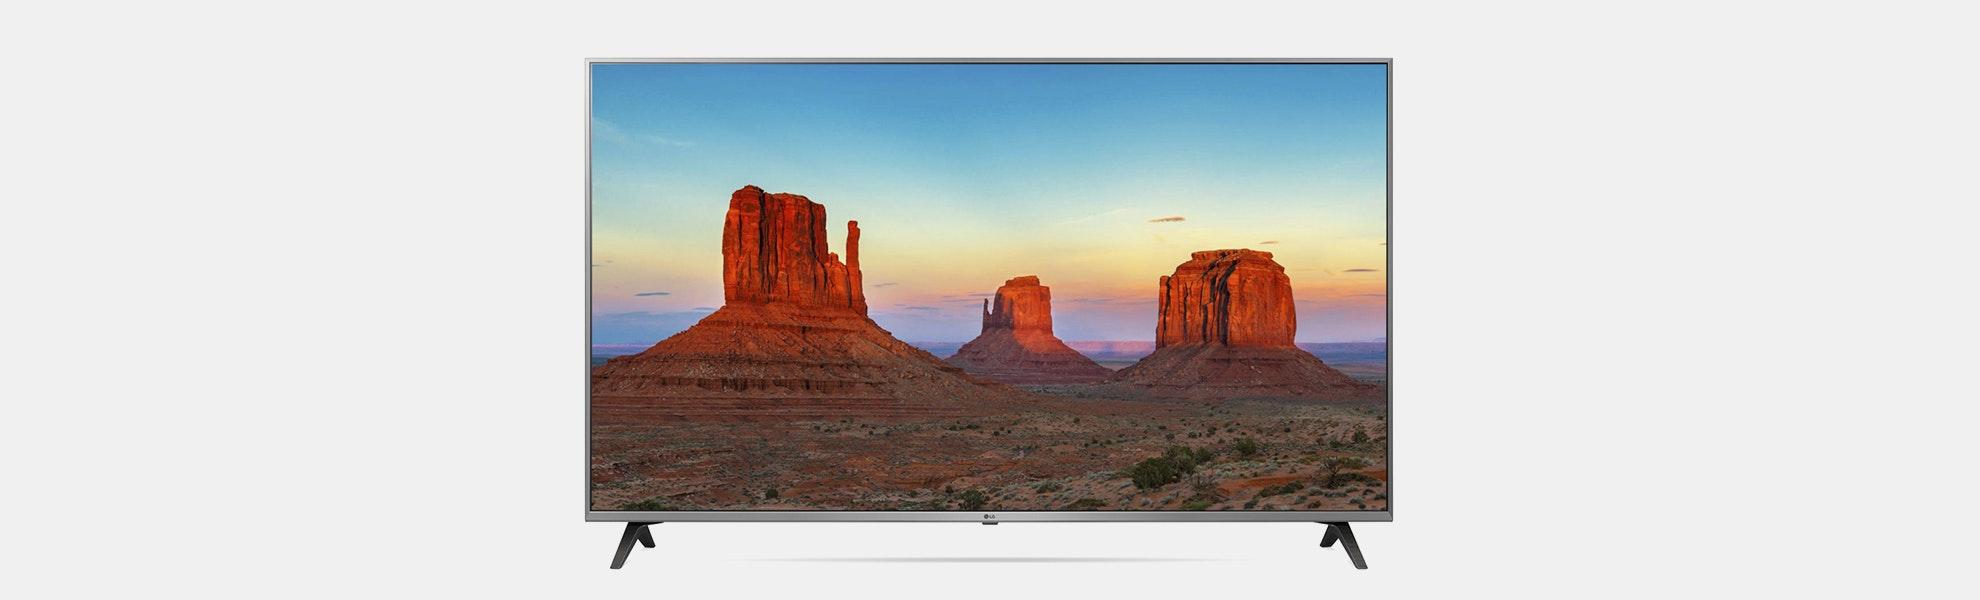 "LG ThinQ 55"" 4K HDR Smart LED UHD TV"